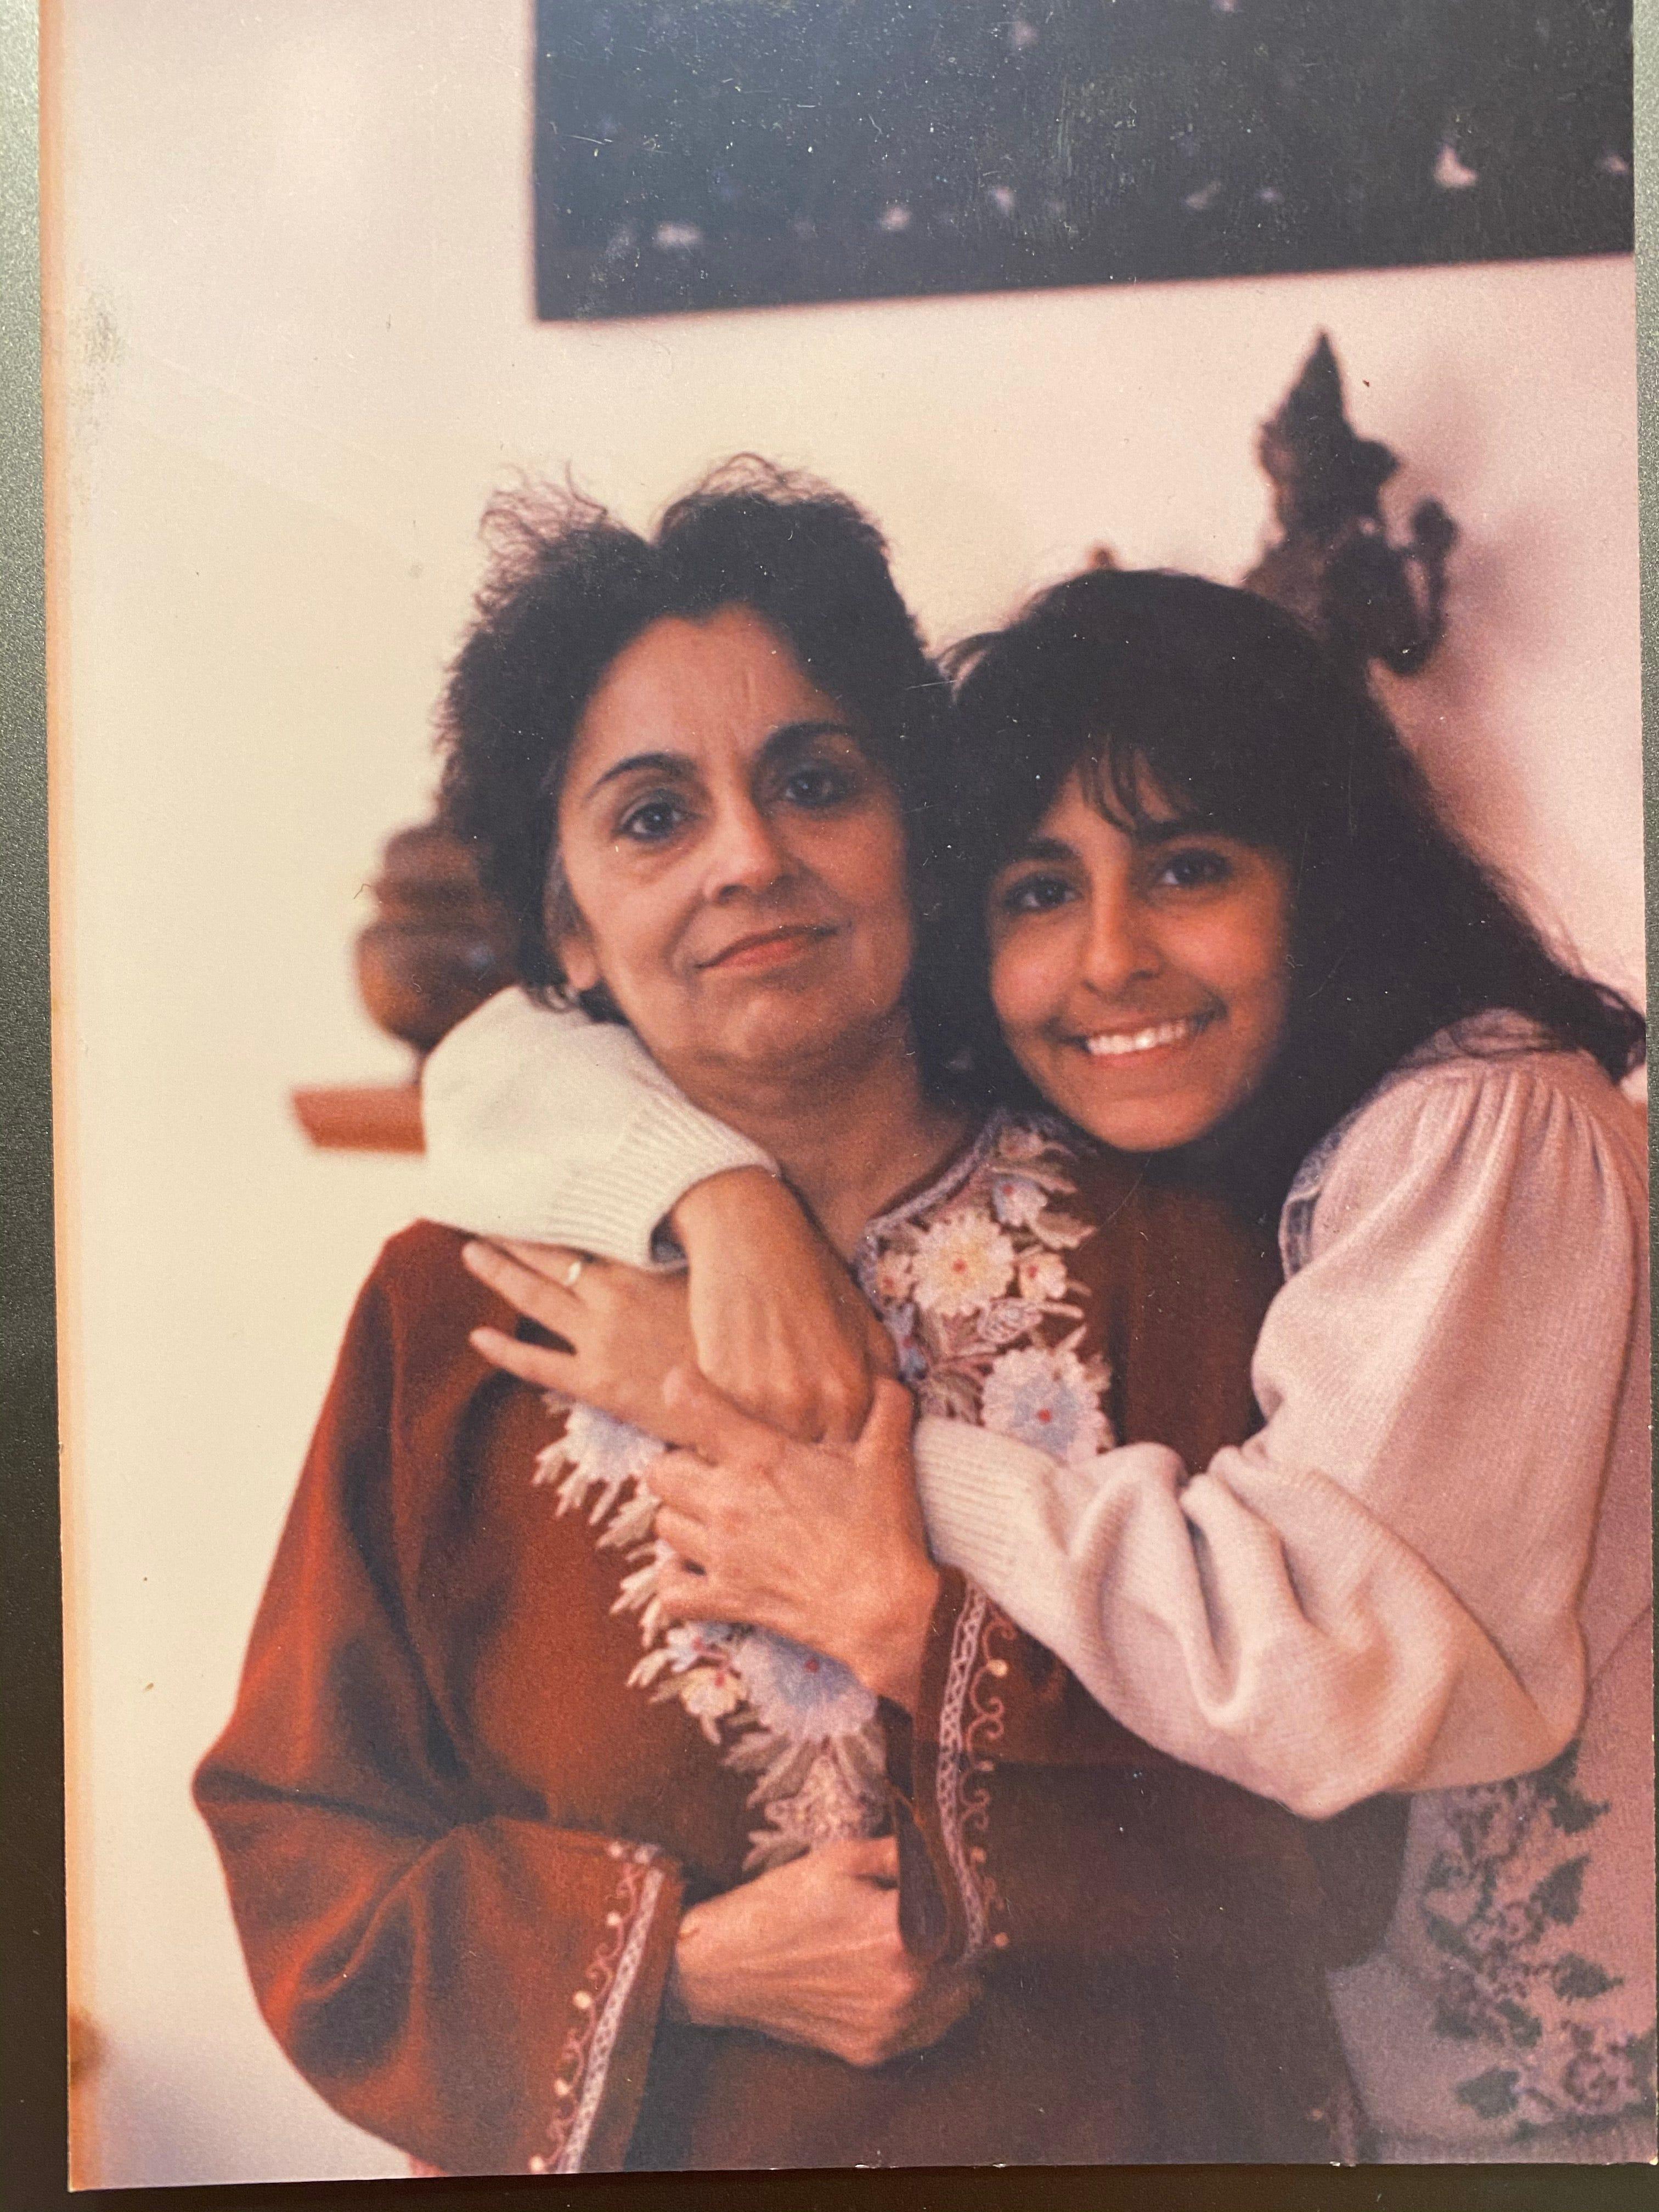 Kamala Harris As Biden Vp Makes Indian Americans Like Me Feel Embraced